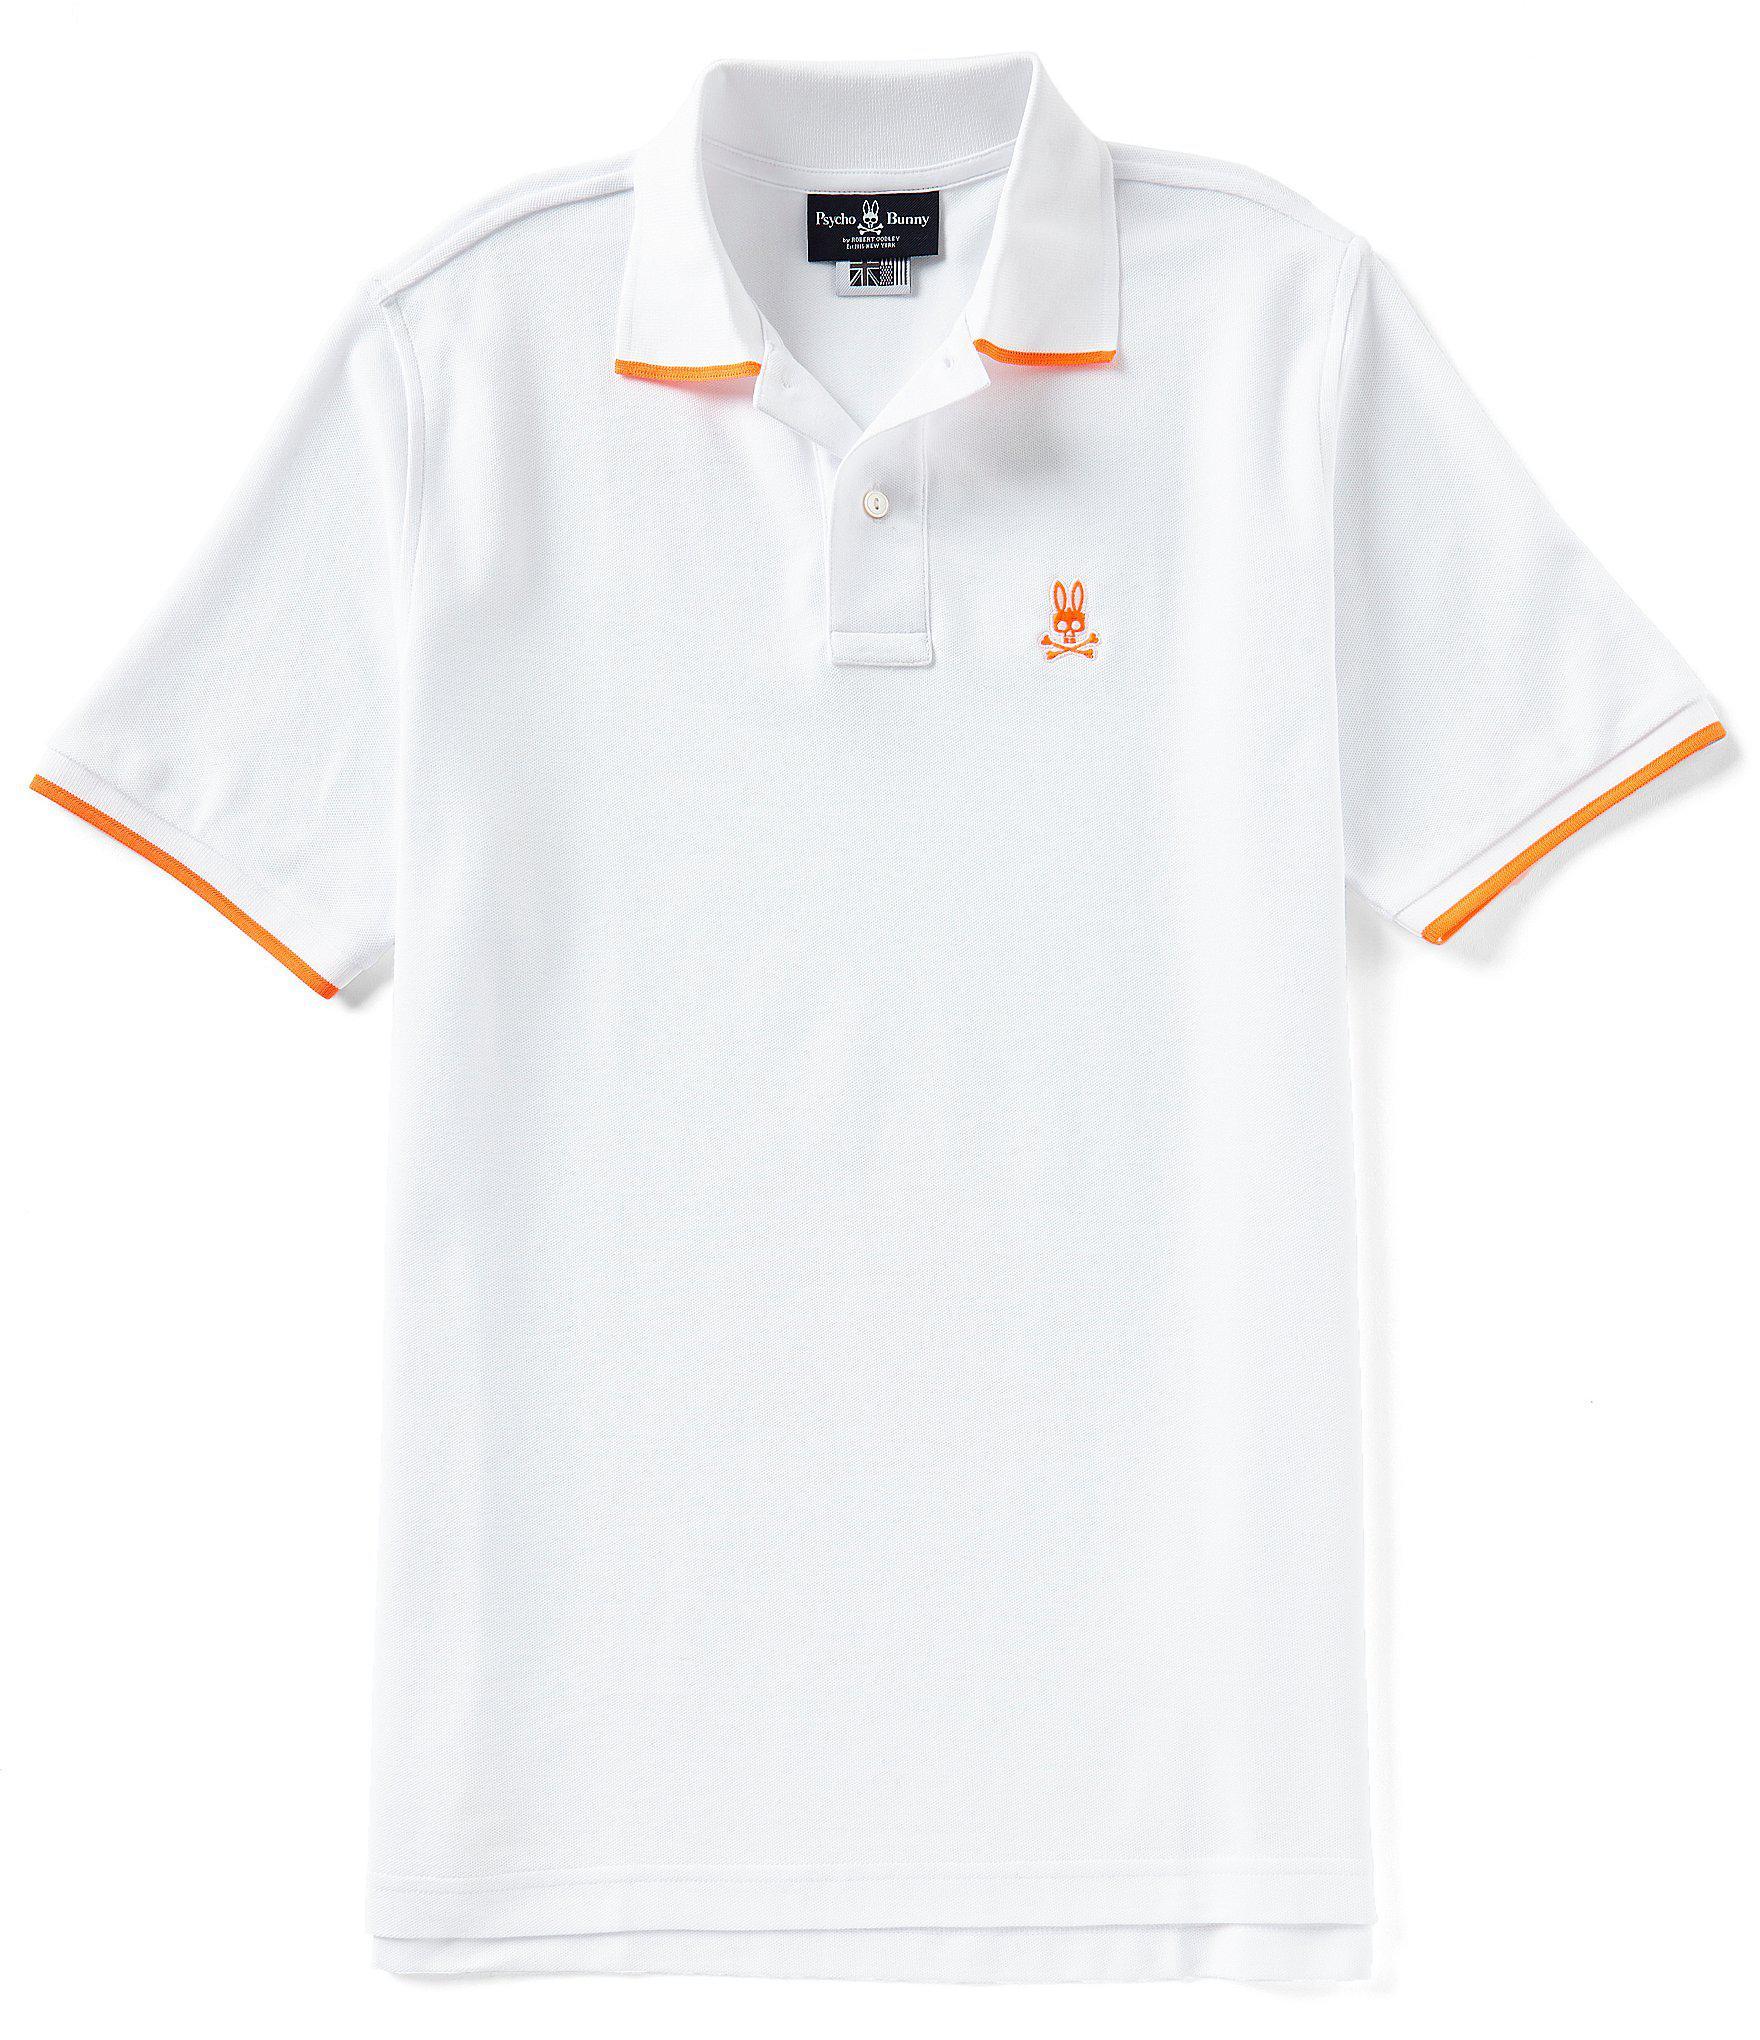 Uga Shirts Polo Labzada T Shirt